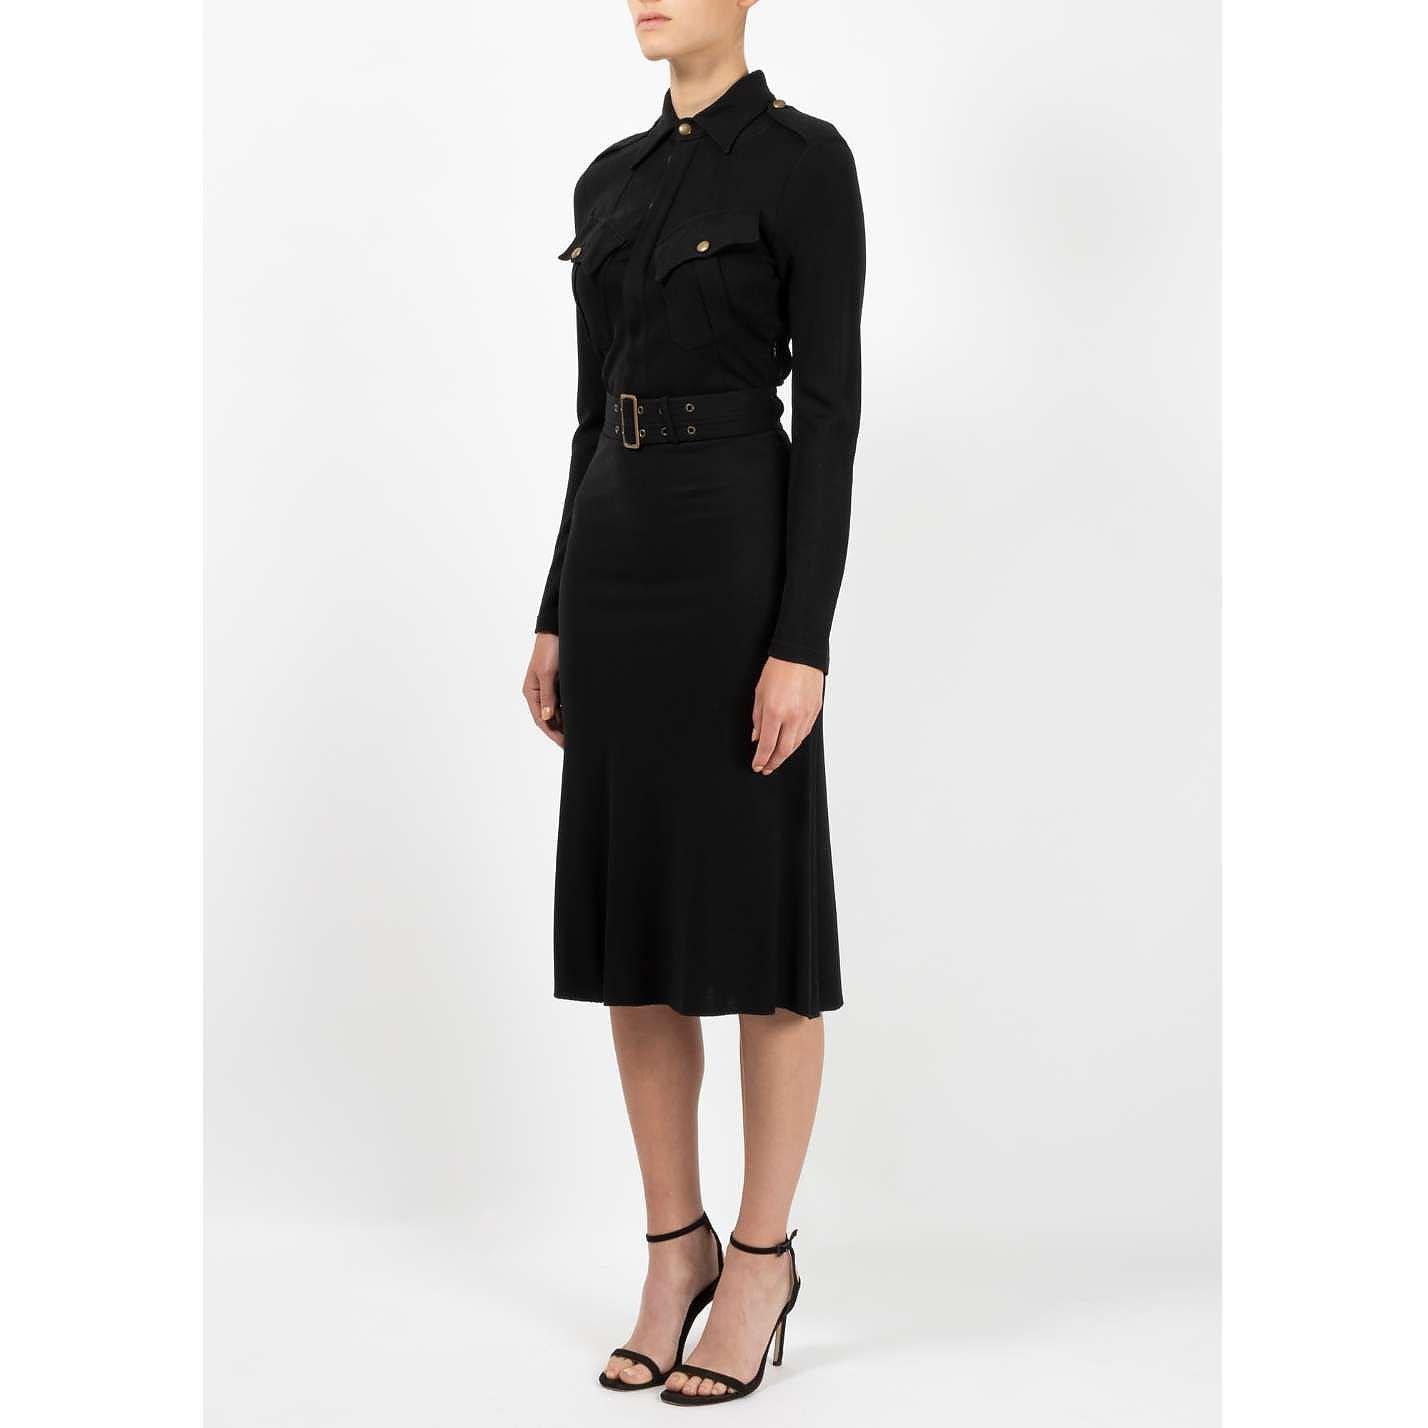 Jean Paul Gaultier Military Style Dress